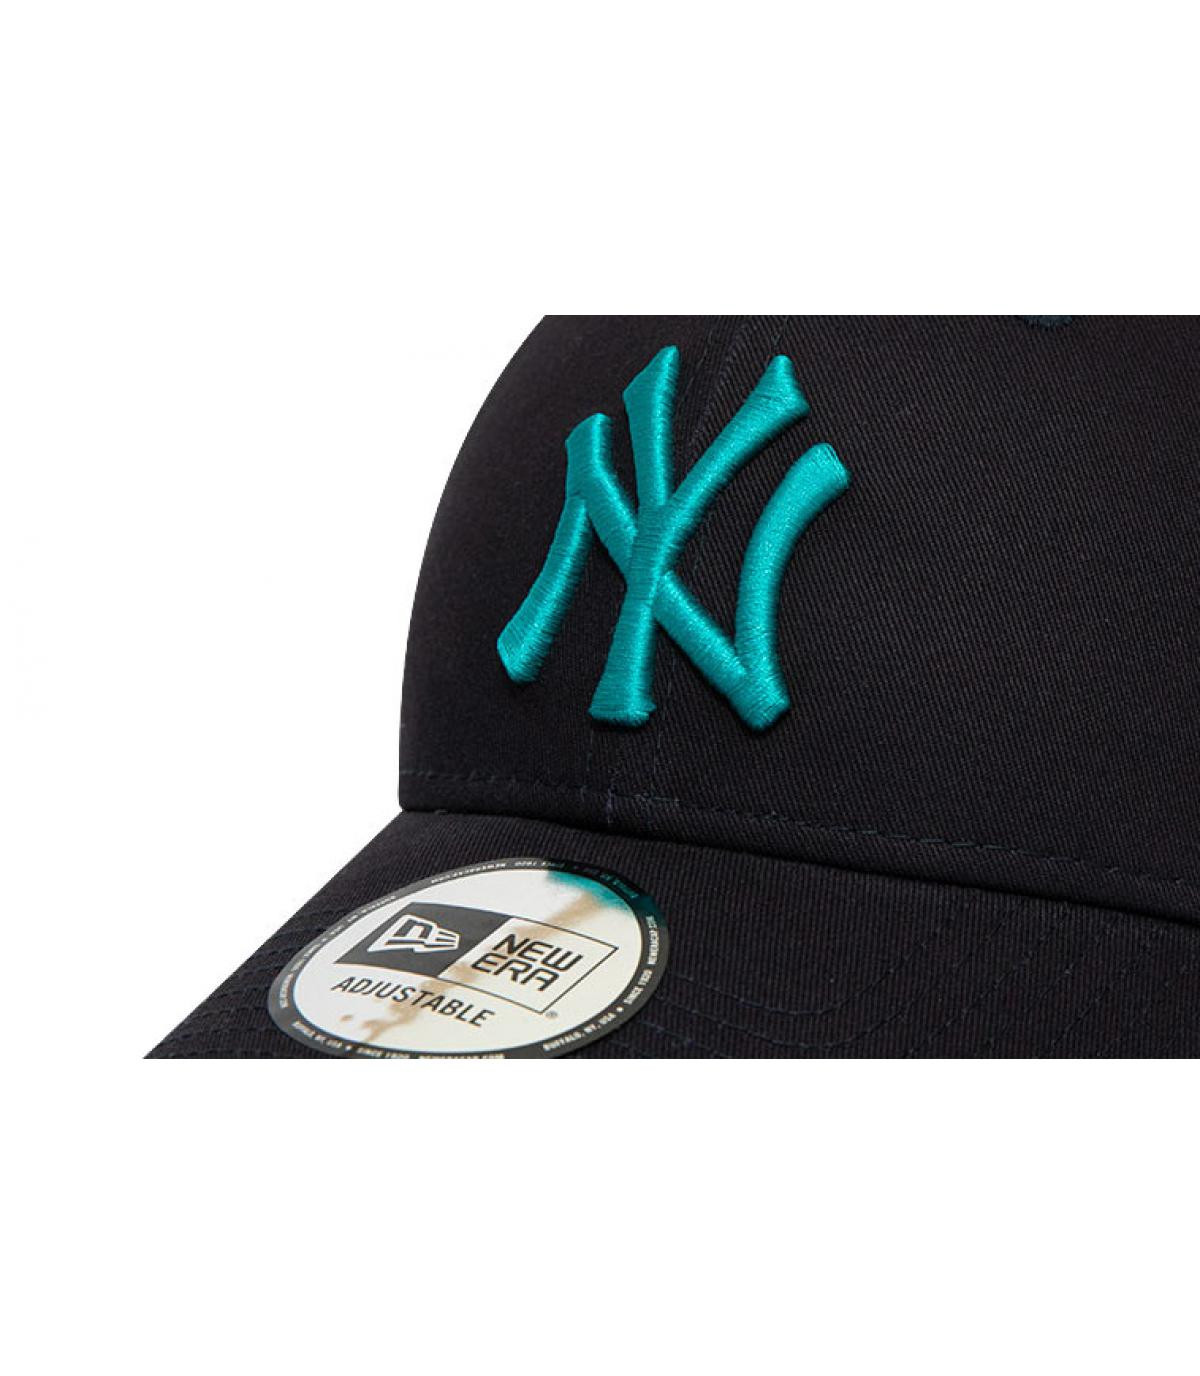 Details Cap League Ess NY 940 navy teal - Abbildung 3